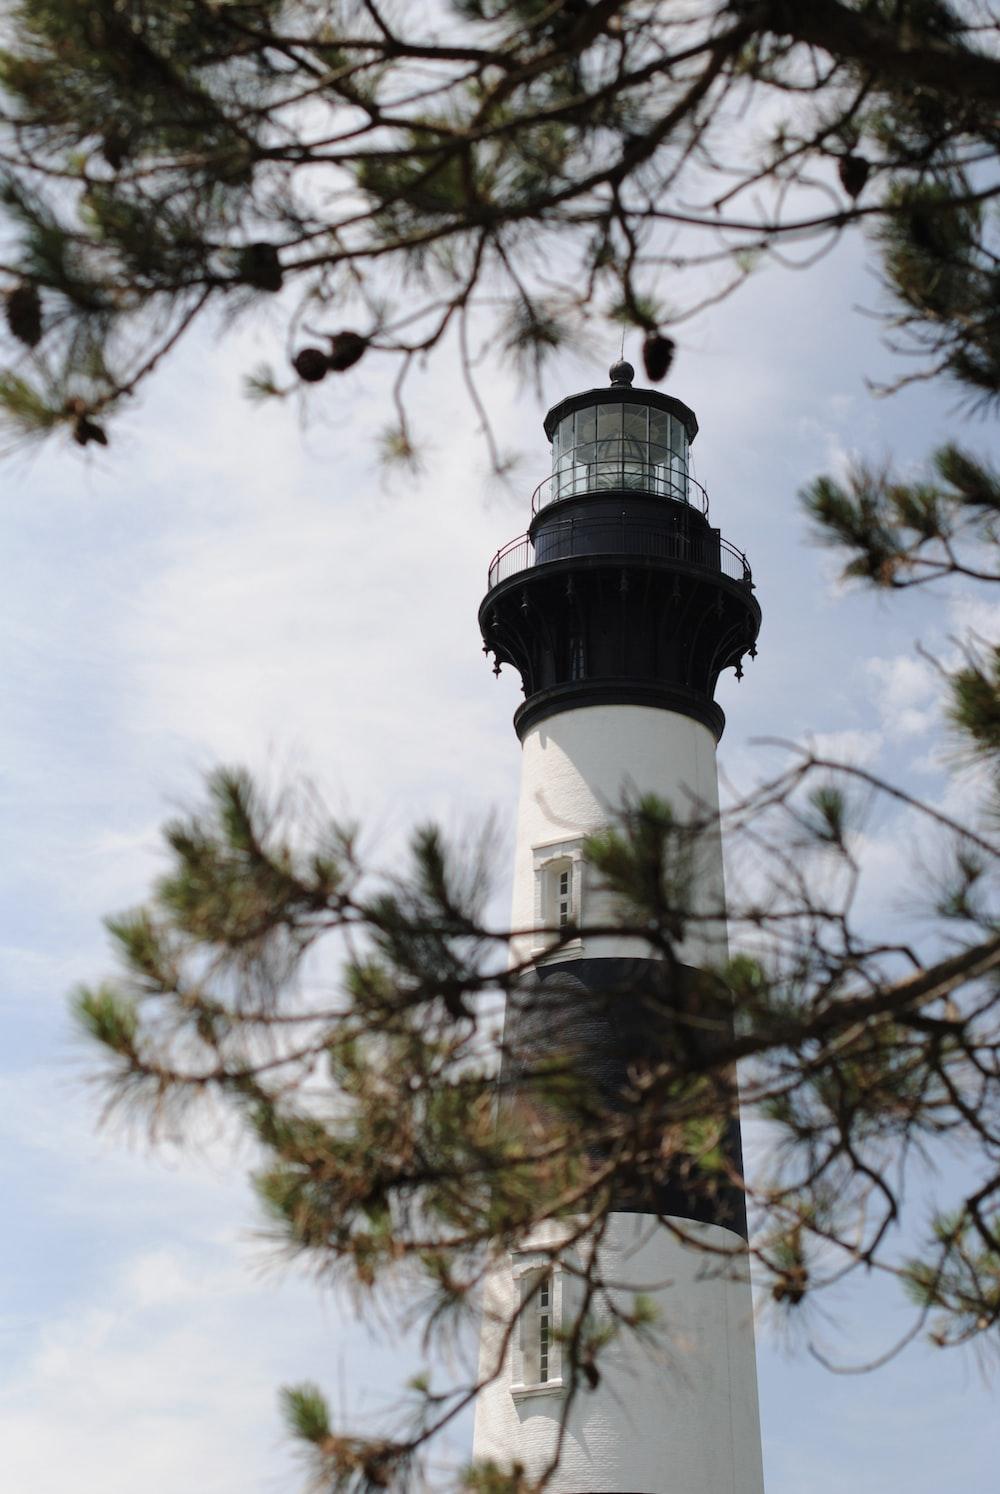 white and black lighthouse under blue sky during daytime